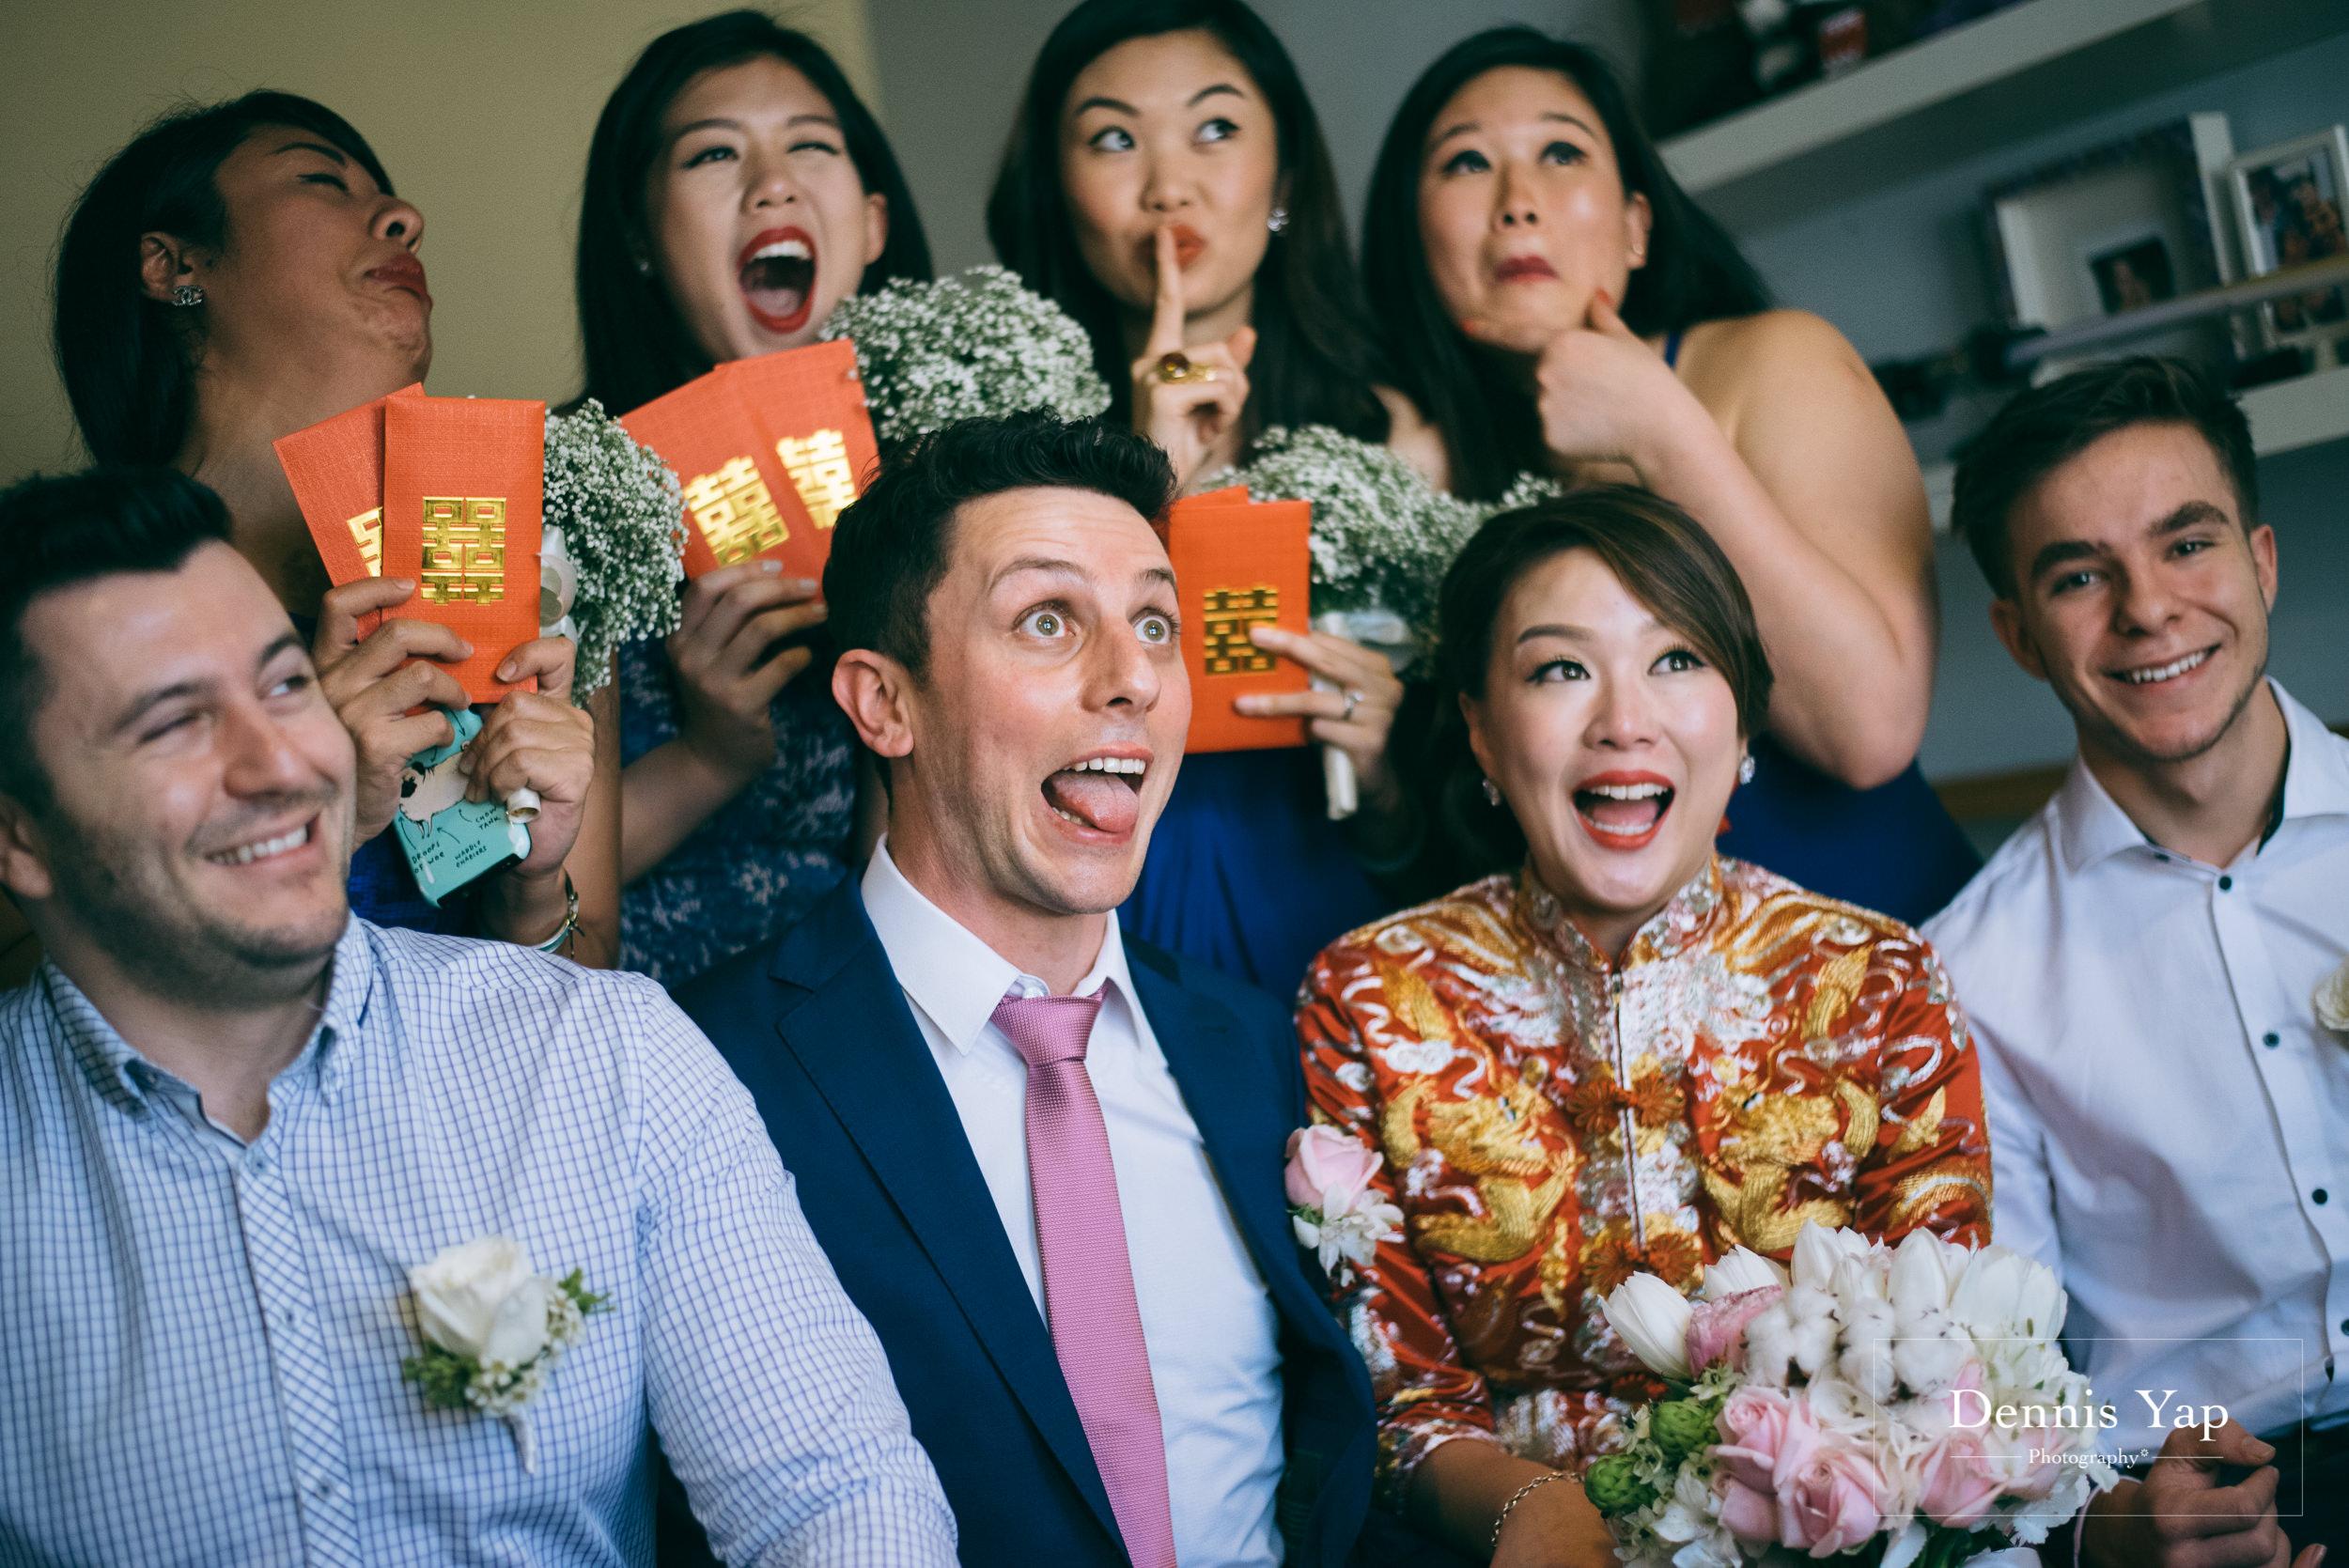 jordan amanda wedding day westin hotel kuala lumpur choe family dennis yap photography-14.jpg